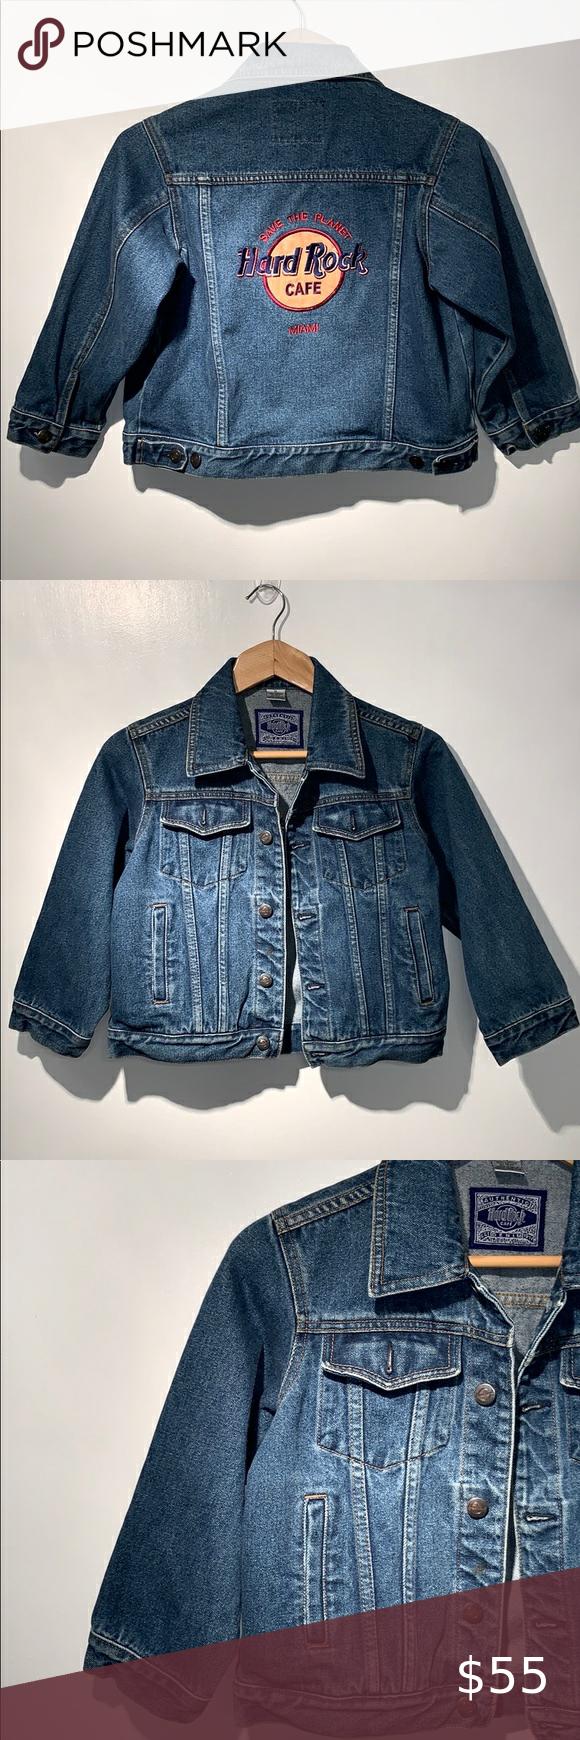 Authentic Hard Rock Cafe Kids Jean Jacket Kids Jeans Jacket Fashion Clothes Design [ 1740 x 580 Pixel ]